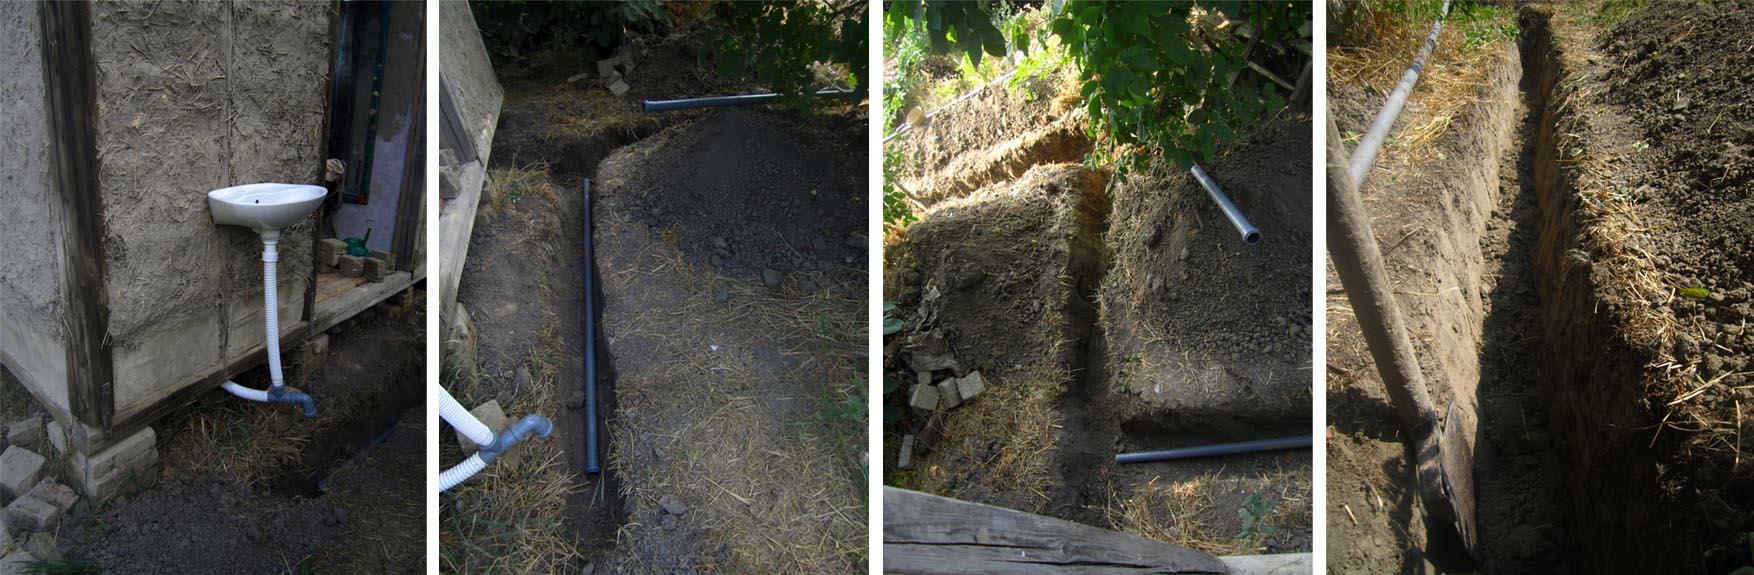 05 kopanje kanala